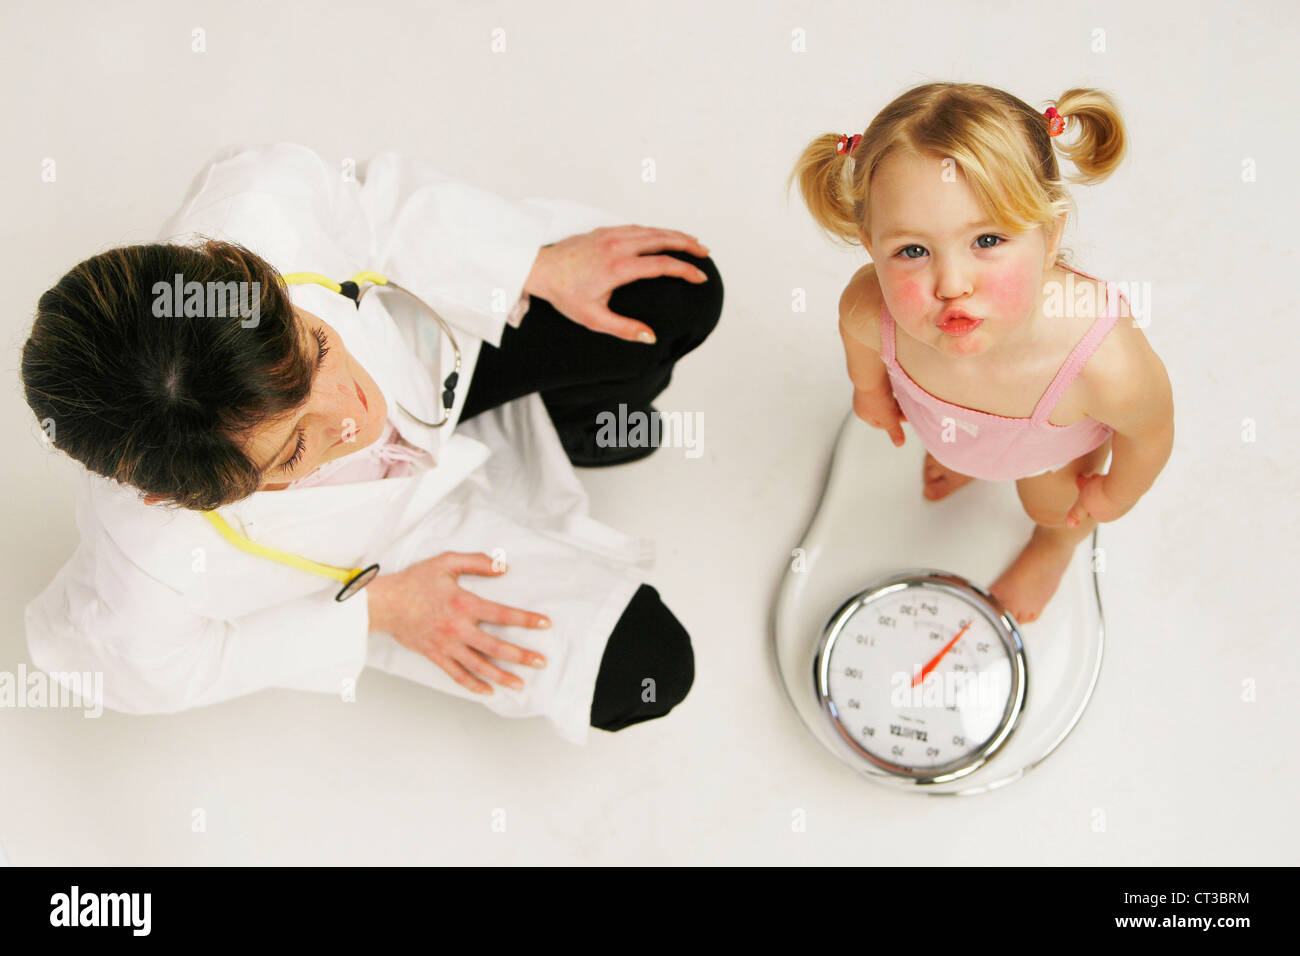 WEIGHT, CHILD - Stock Image